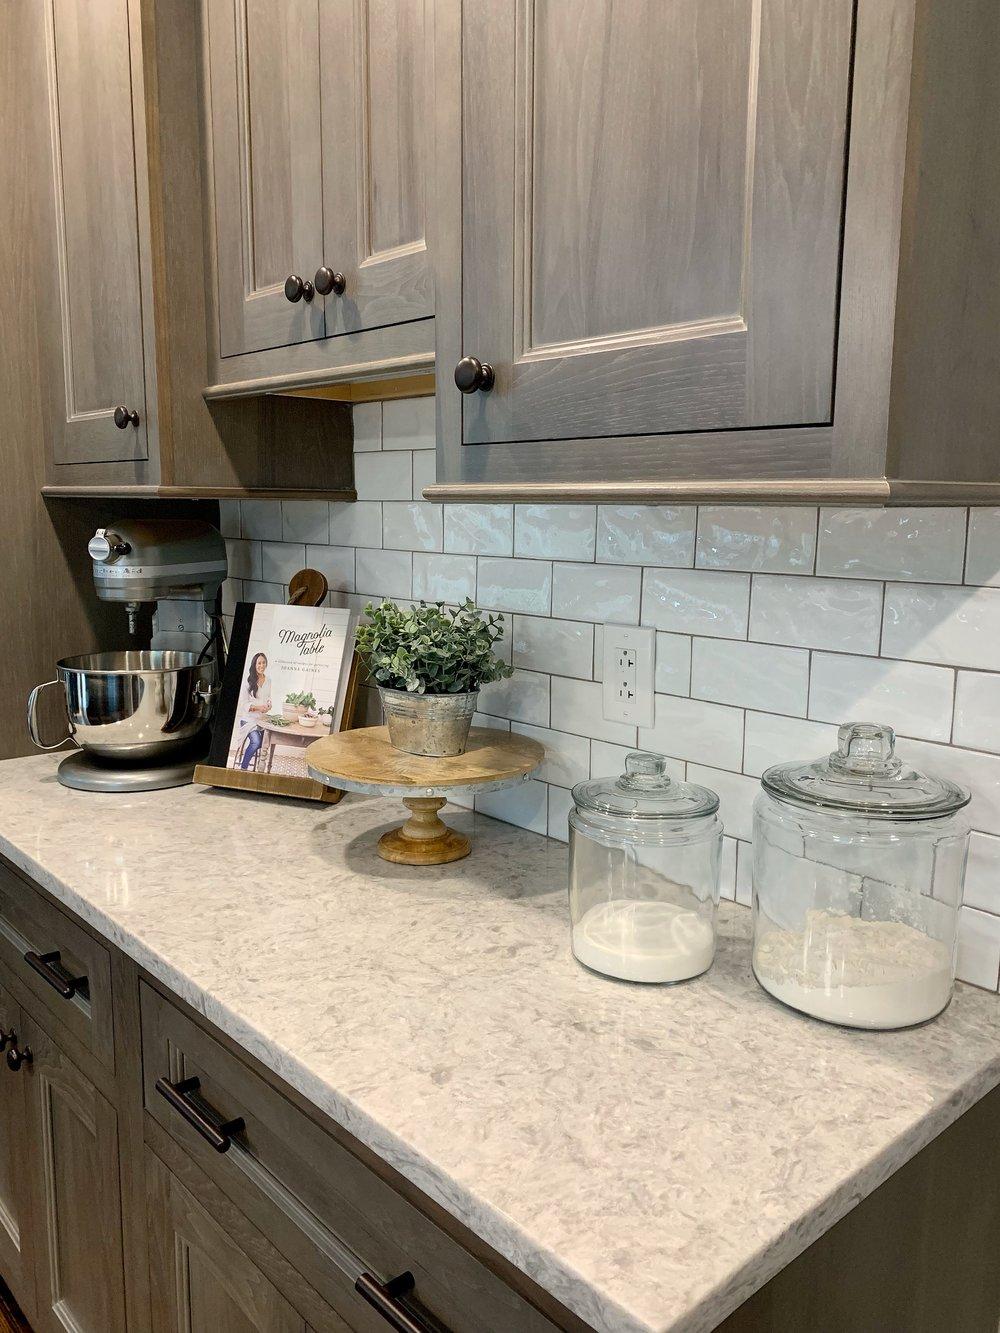 Ideas for Kitchen Countertop Decor — The Decor Formula